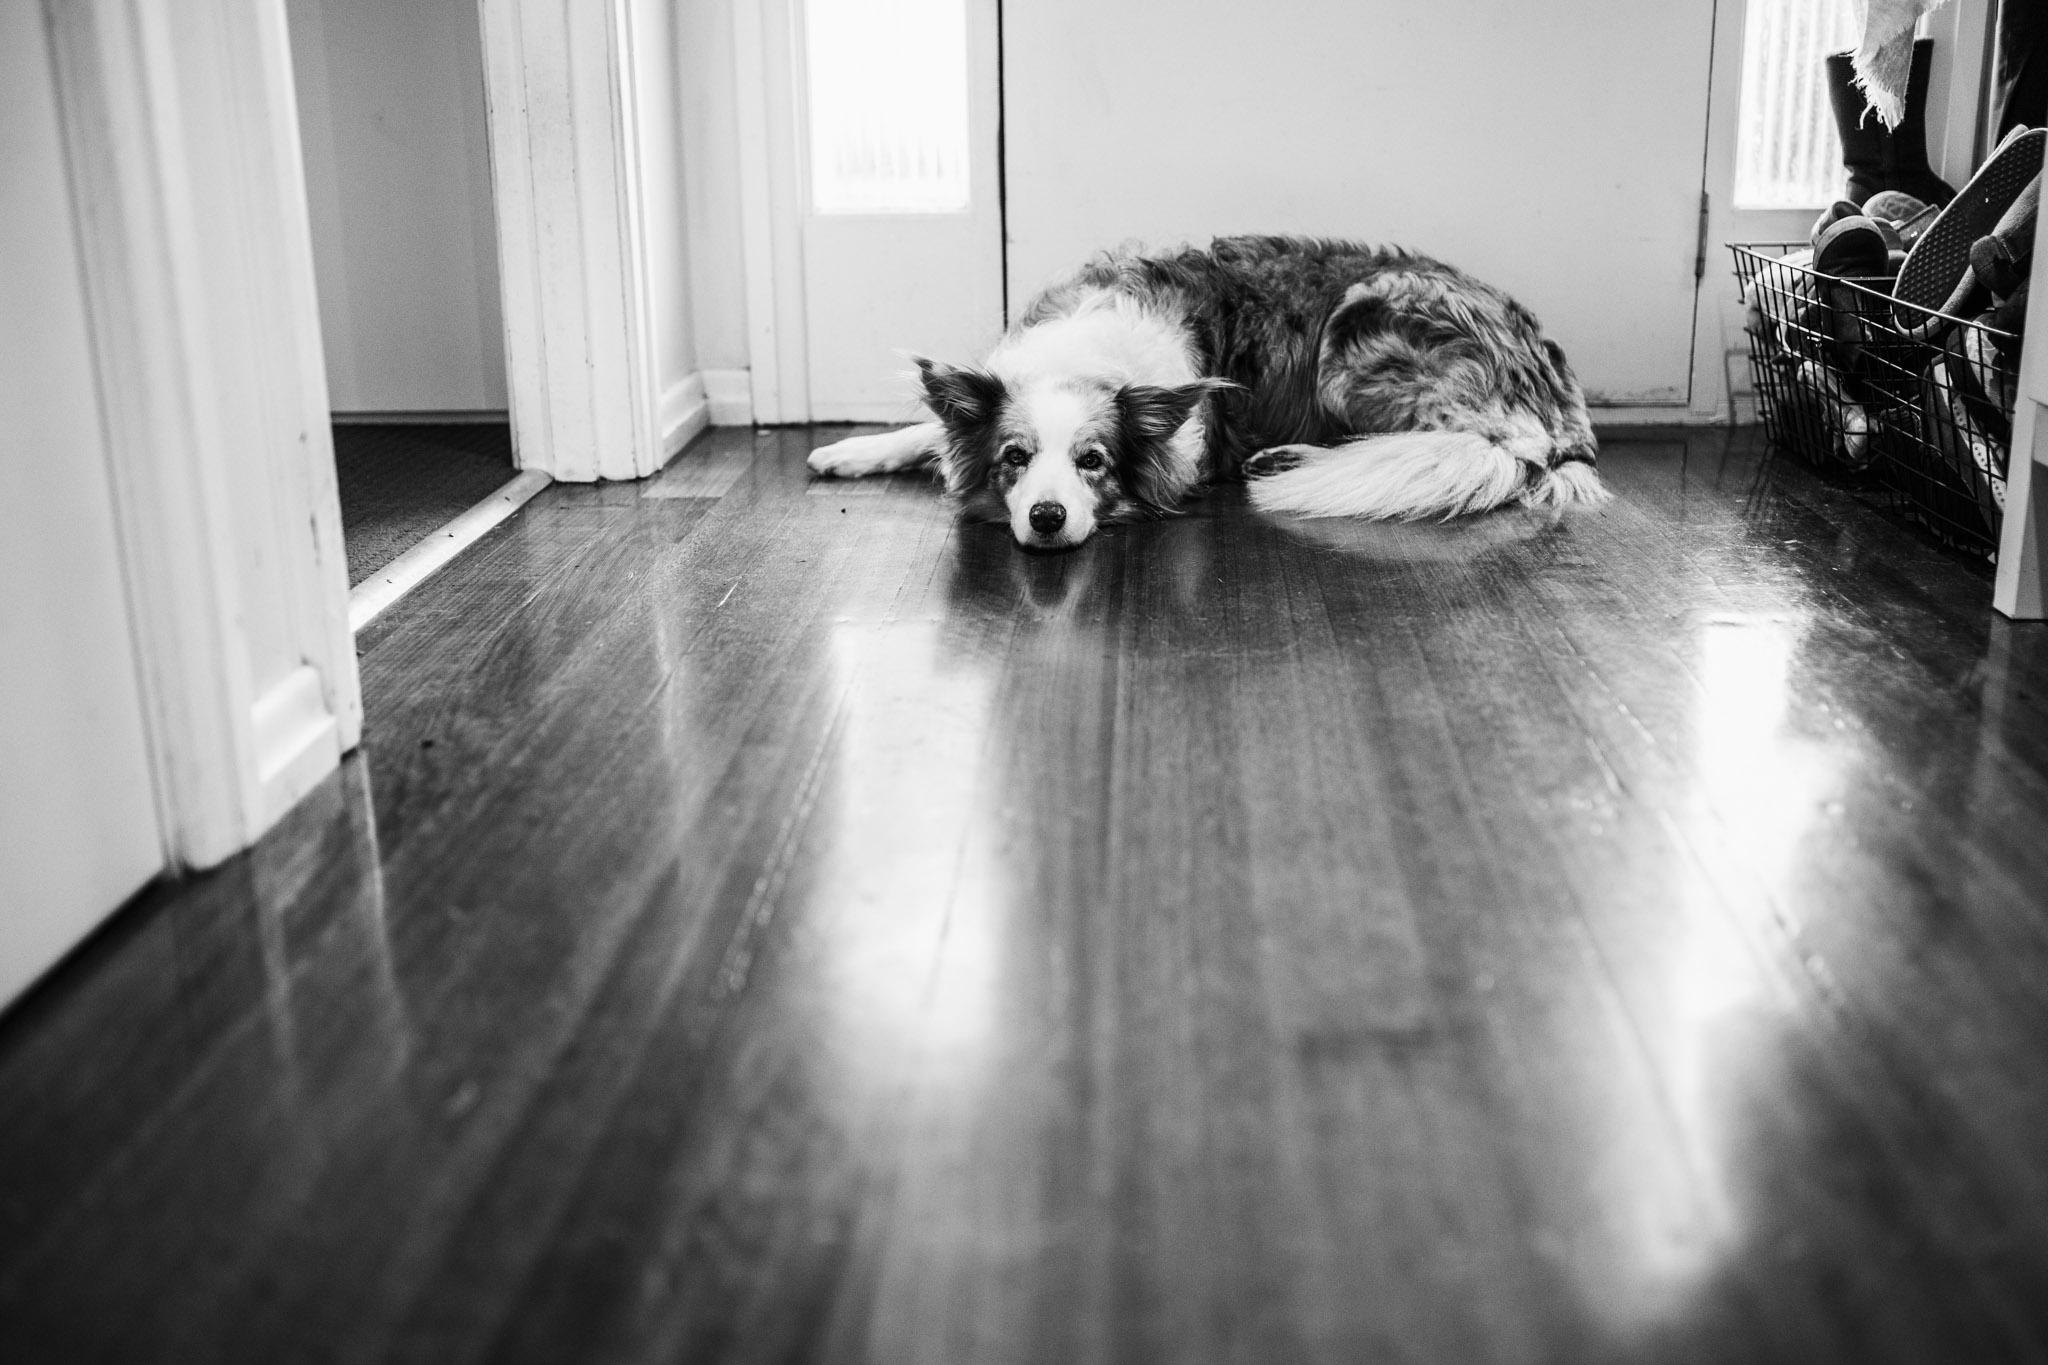 Dog in the hallway.